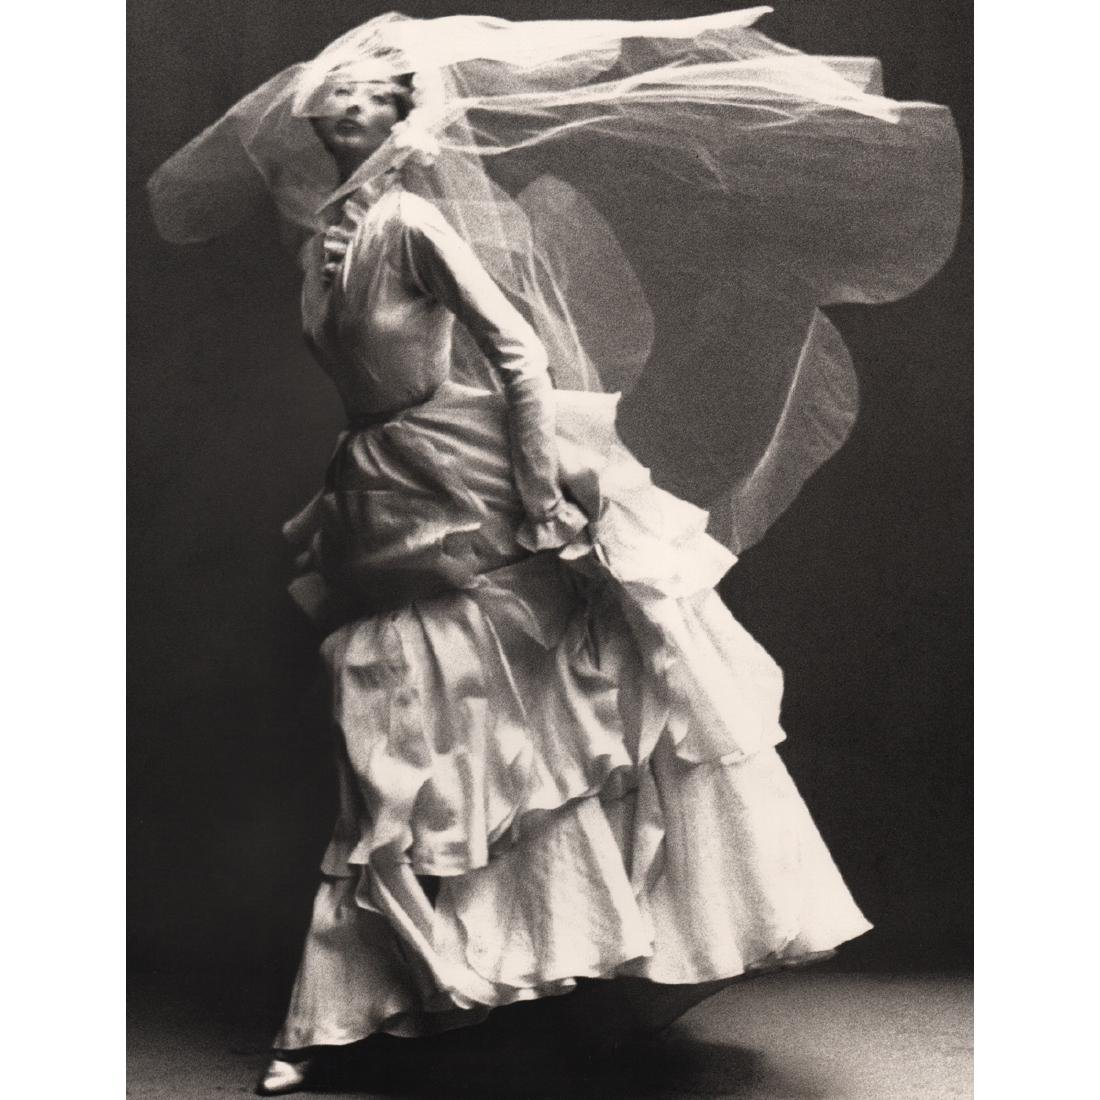 RICHARD AVEDON - Dorian Leigh, NYC 1949